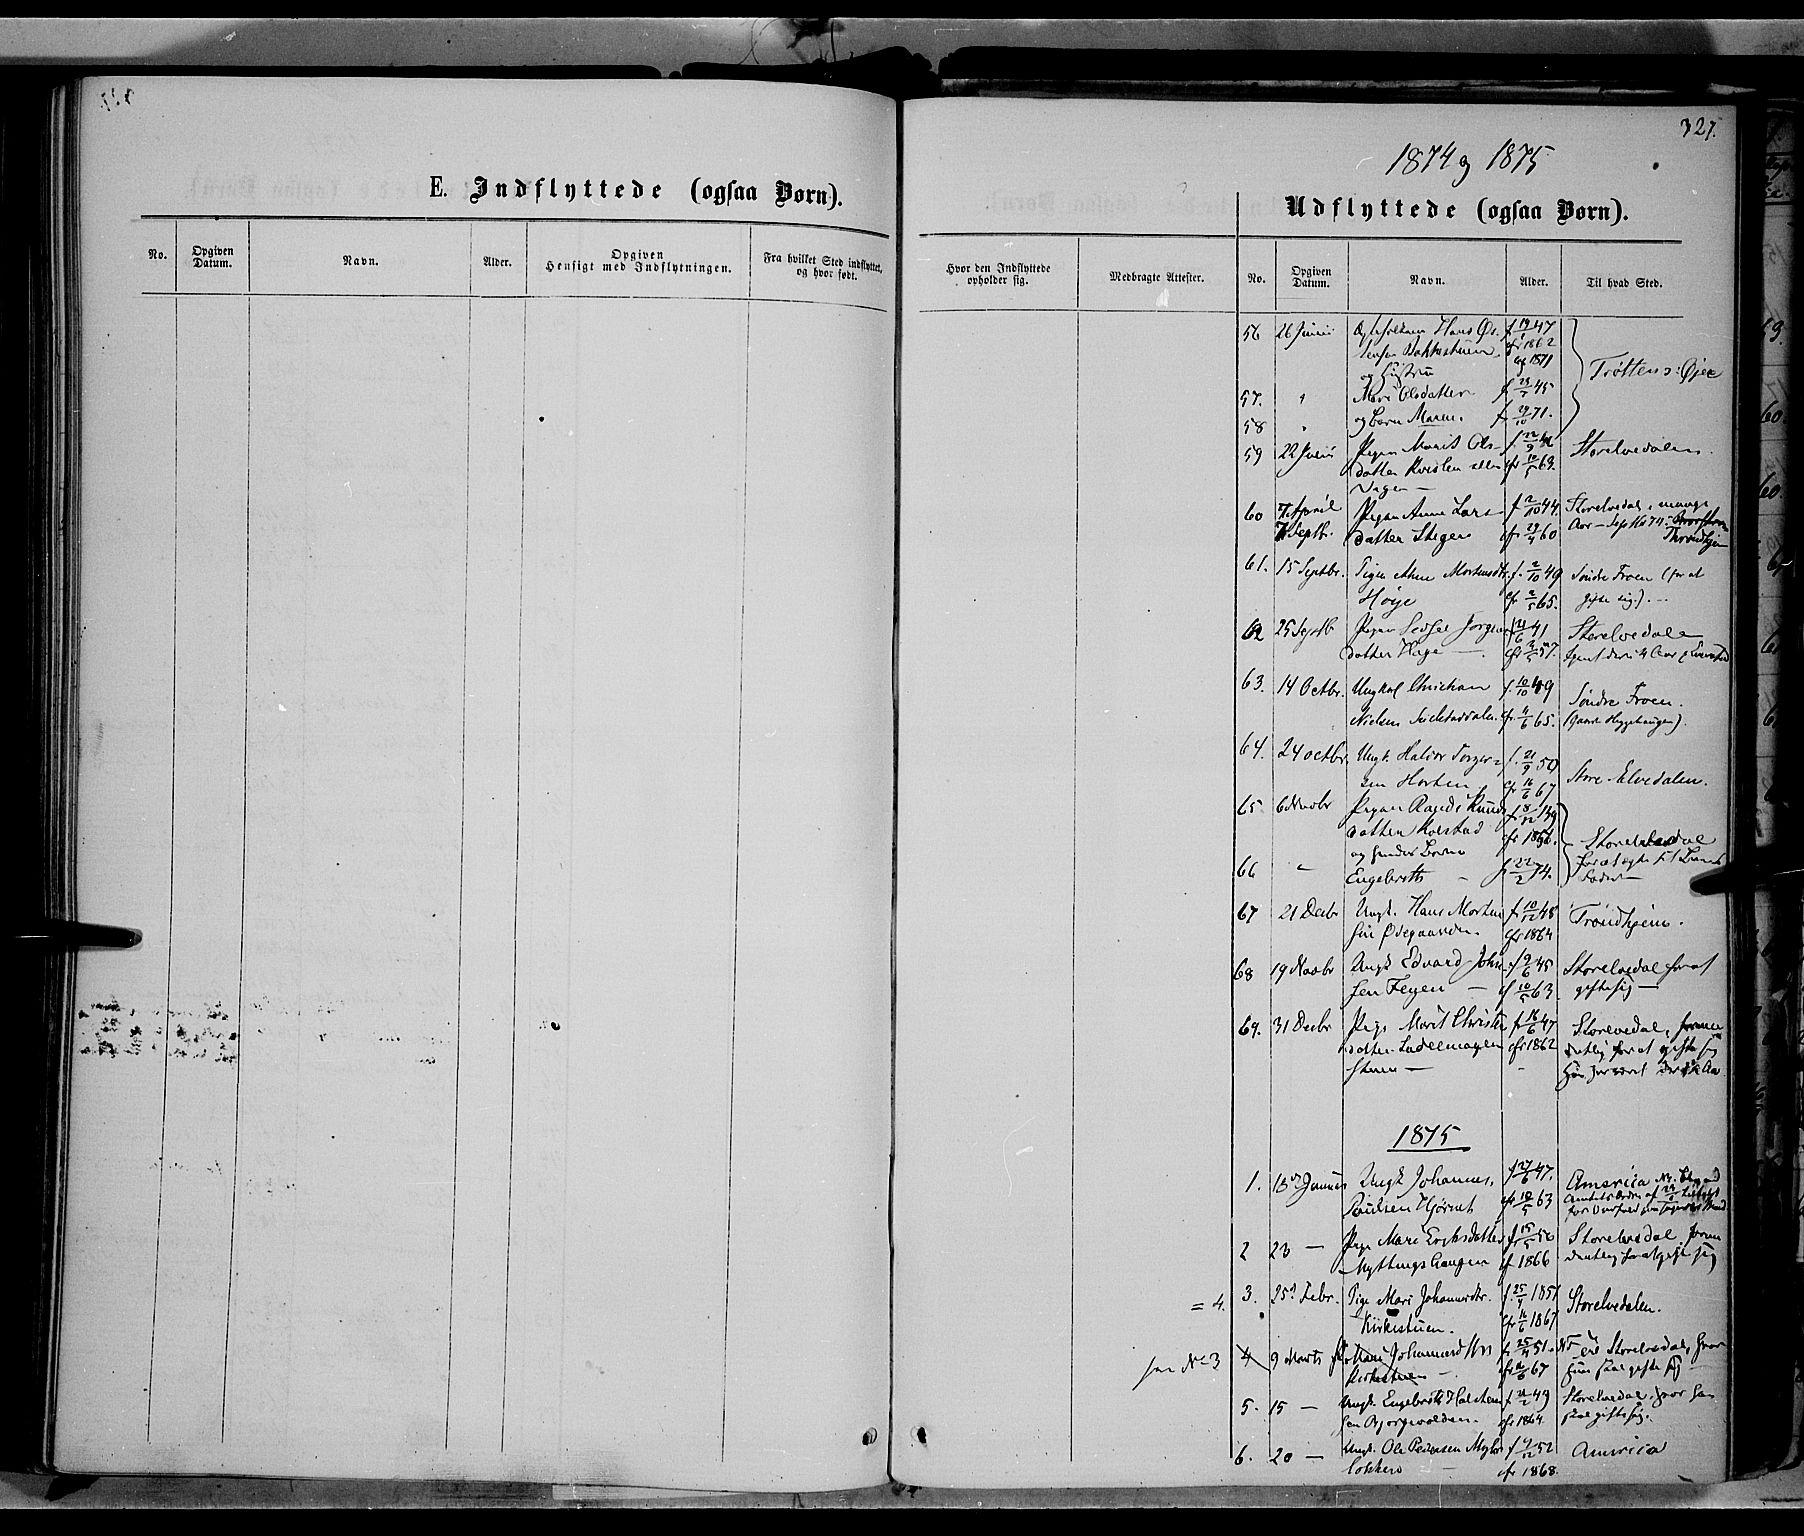 SAH, Ringebu prestekontor, Ministerialbok nr. 7, 1860-1877, s. 327